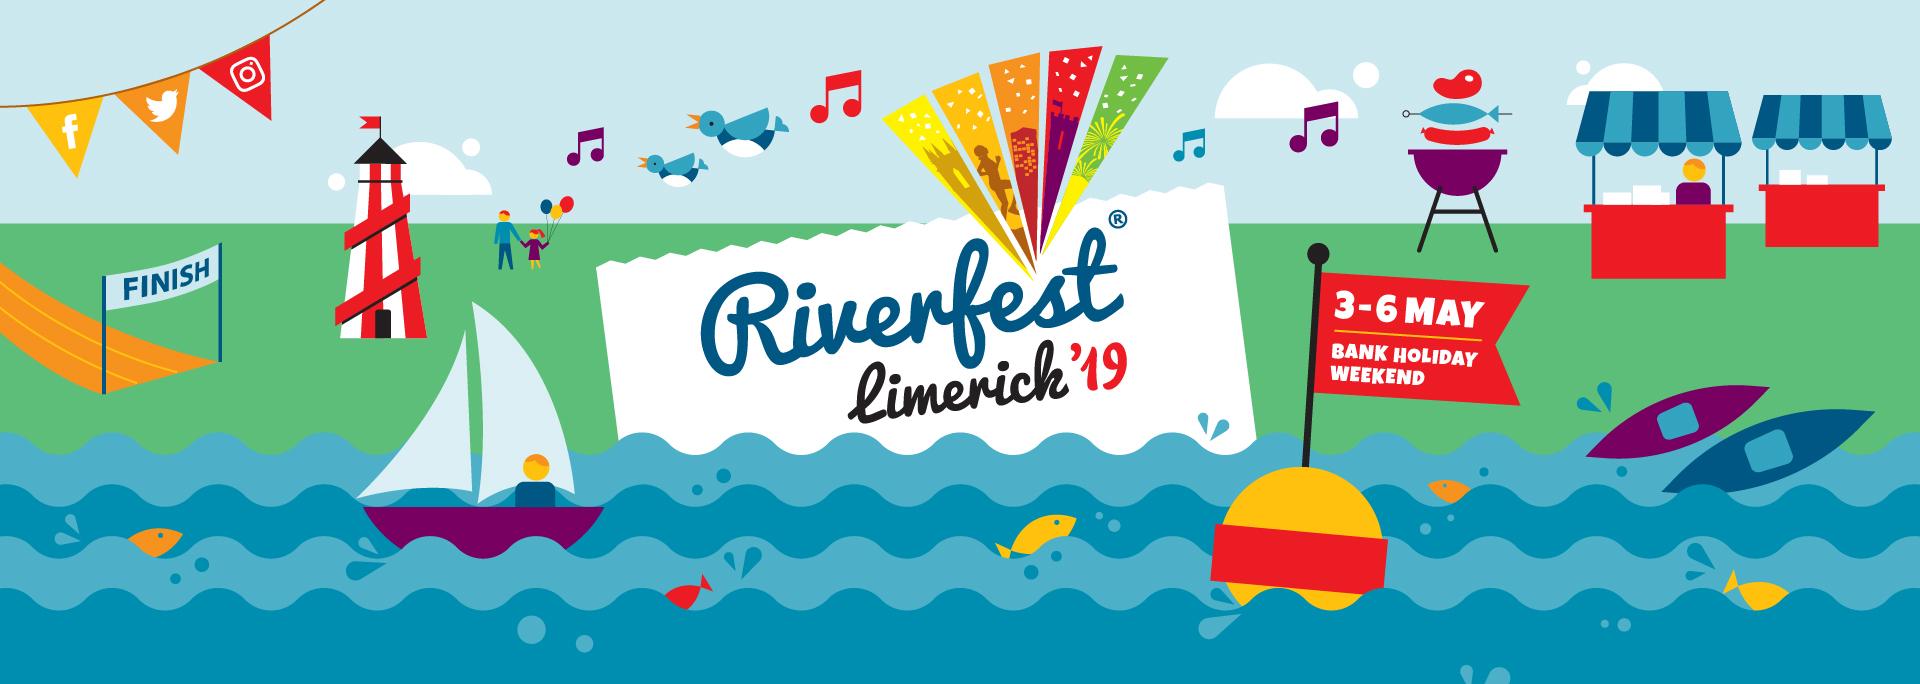 Riverfest Limerick Brand Illustrations Piquant Media Feature Image